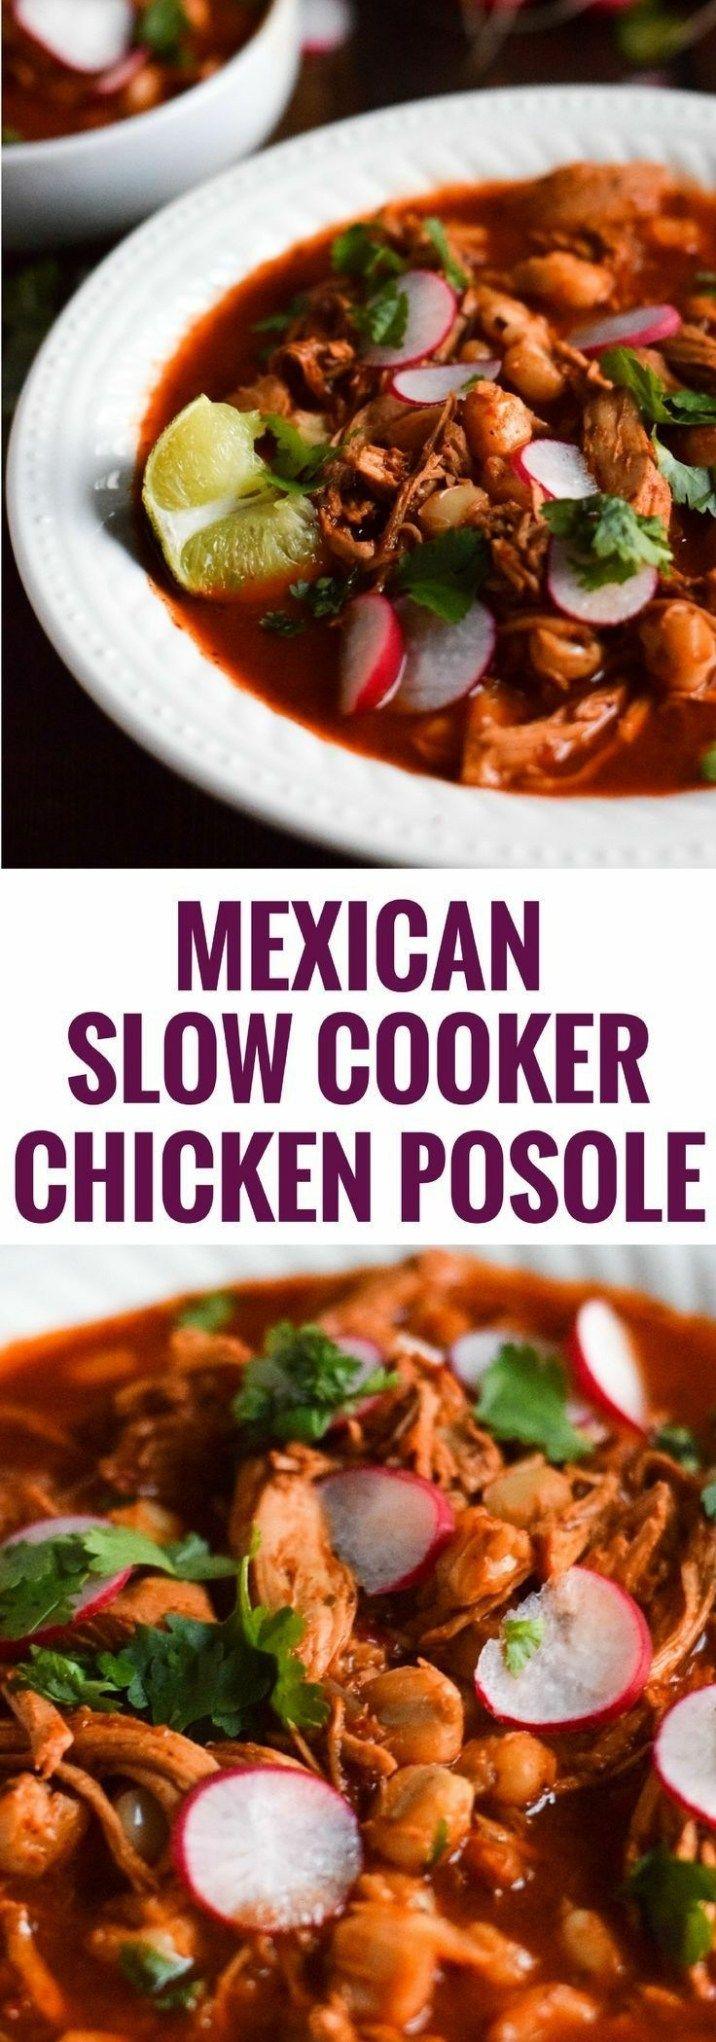 Slow Cooker Chicken Posole